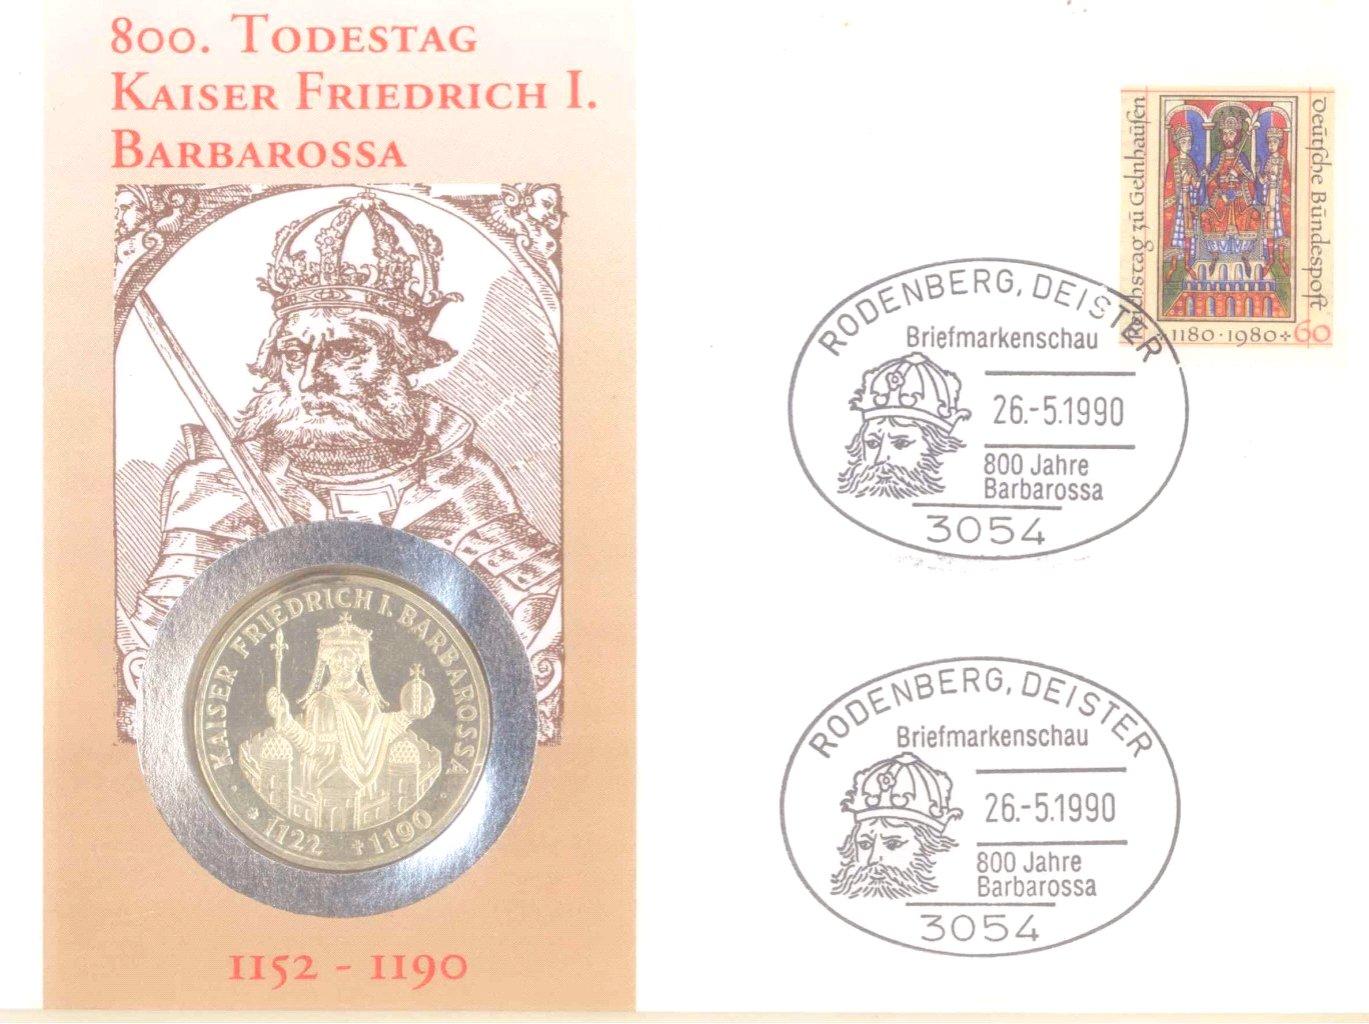 Sammlung Borek Numisbriefe im Ringbinder-5